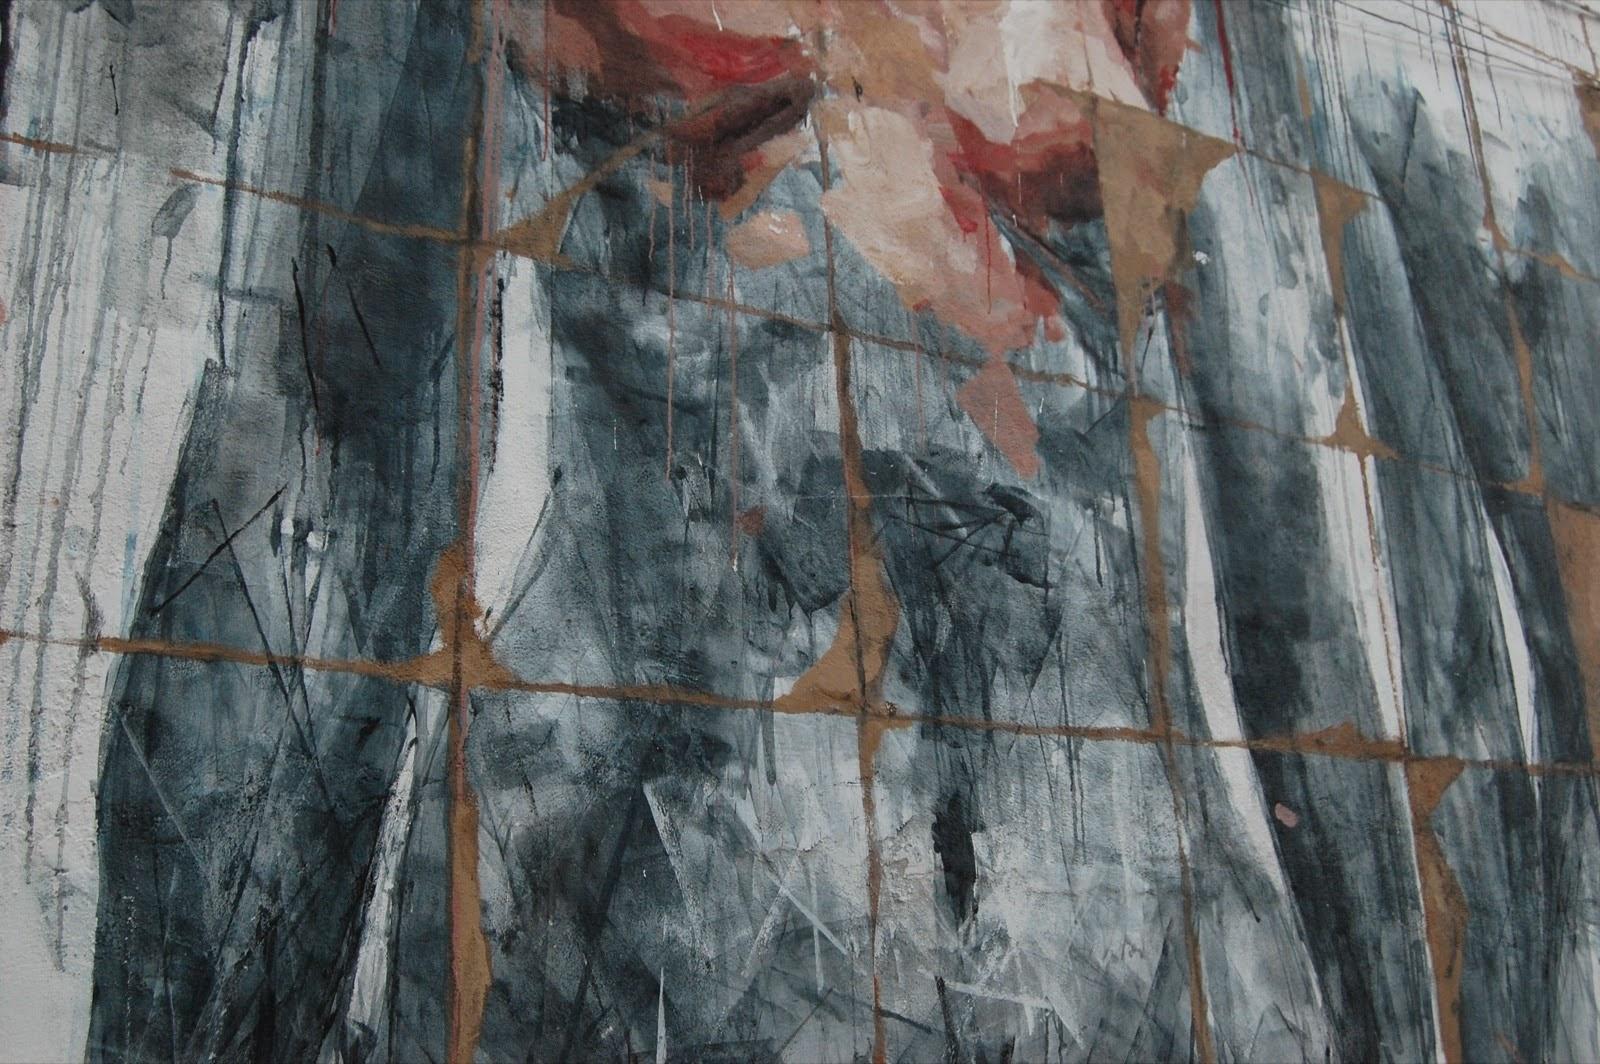 borondo-new-mural-in-lagos-portugal-04